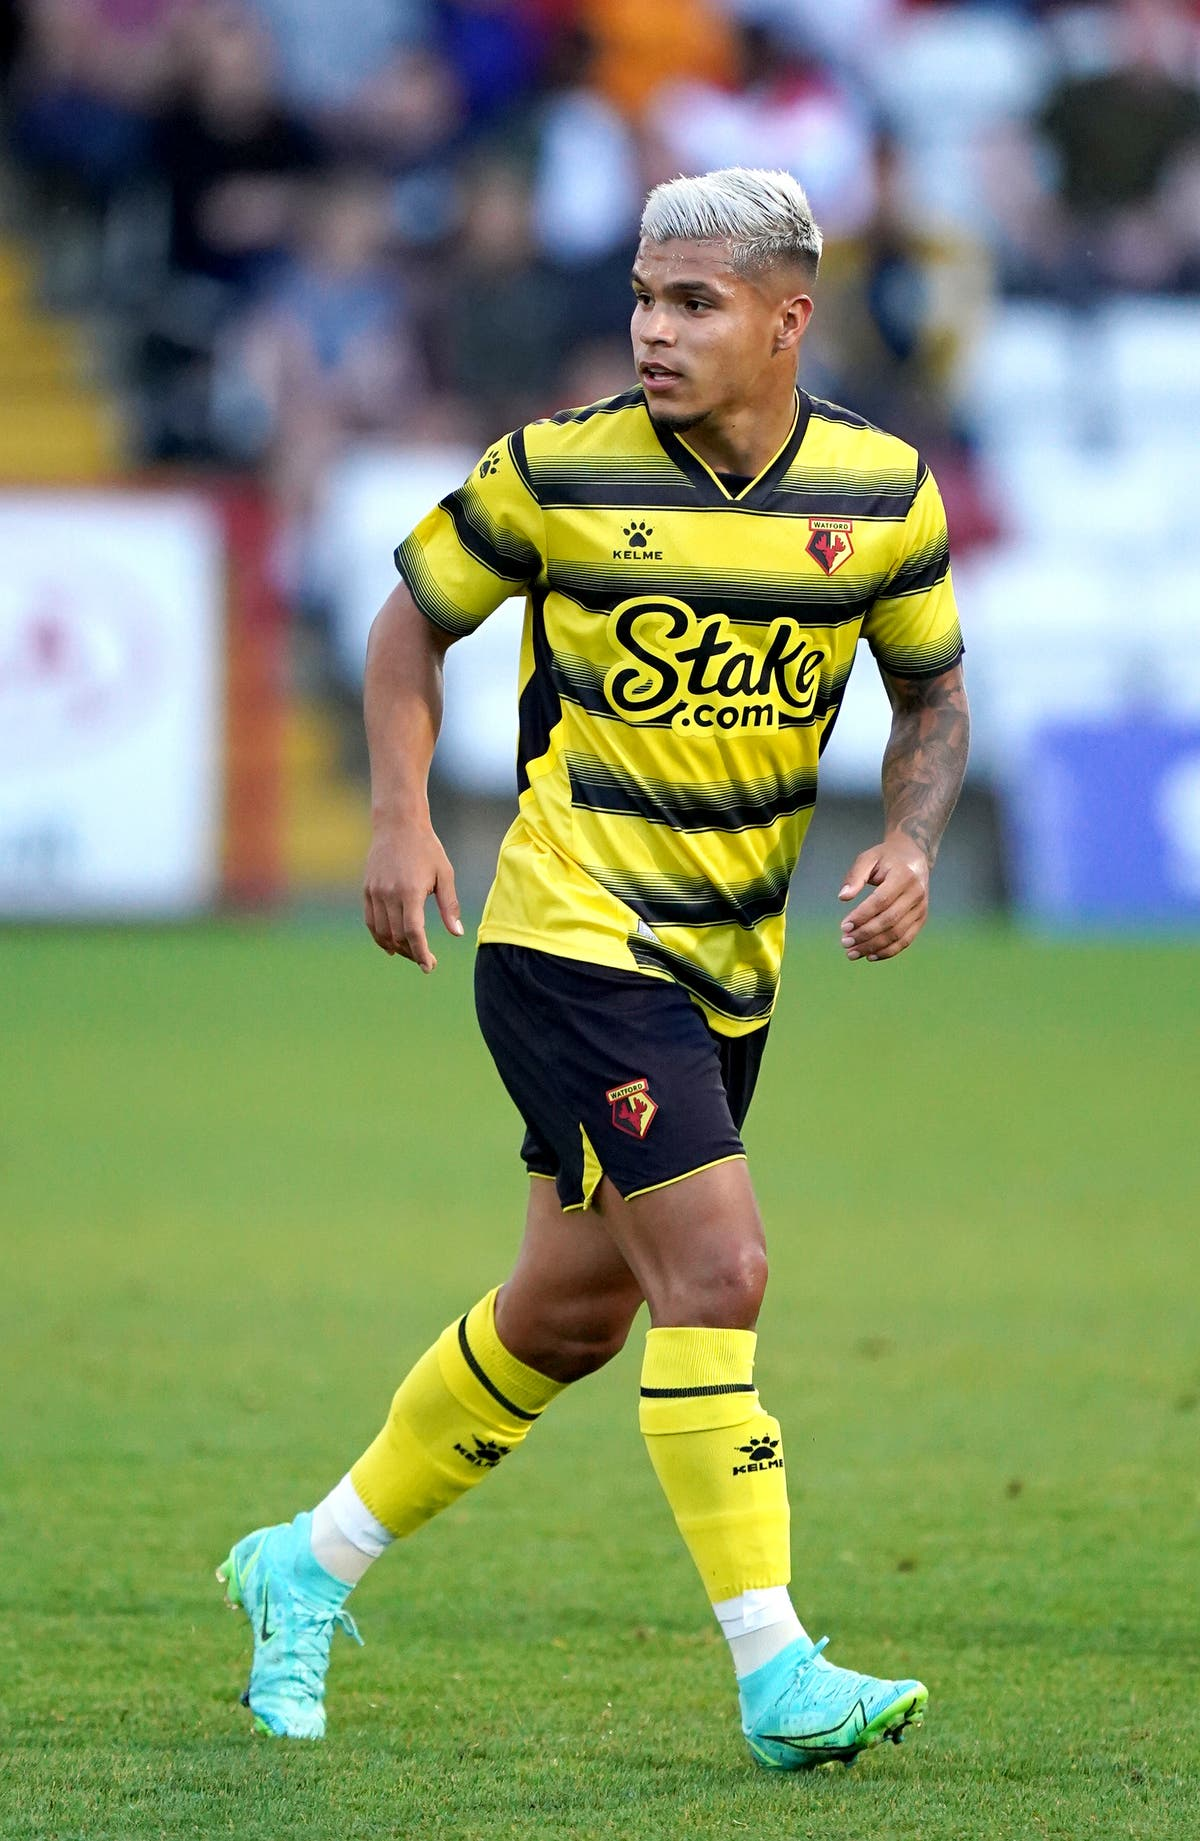 Watford's Cucho Hernandez out to emulate Sergio Aguero in Premier League